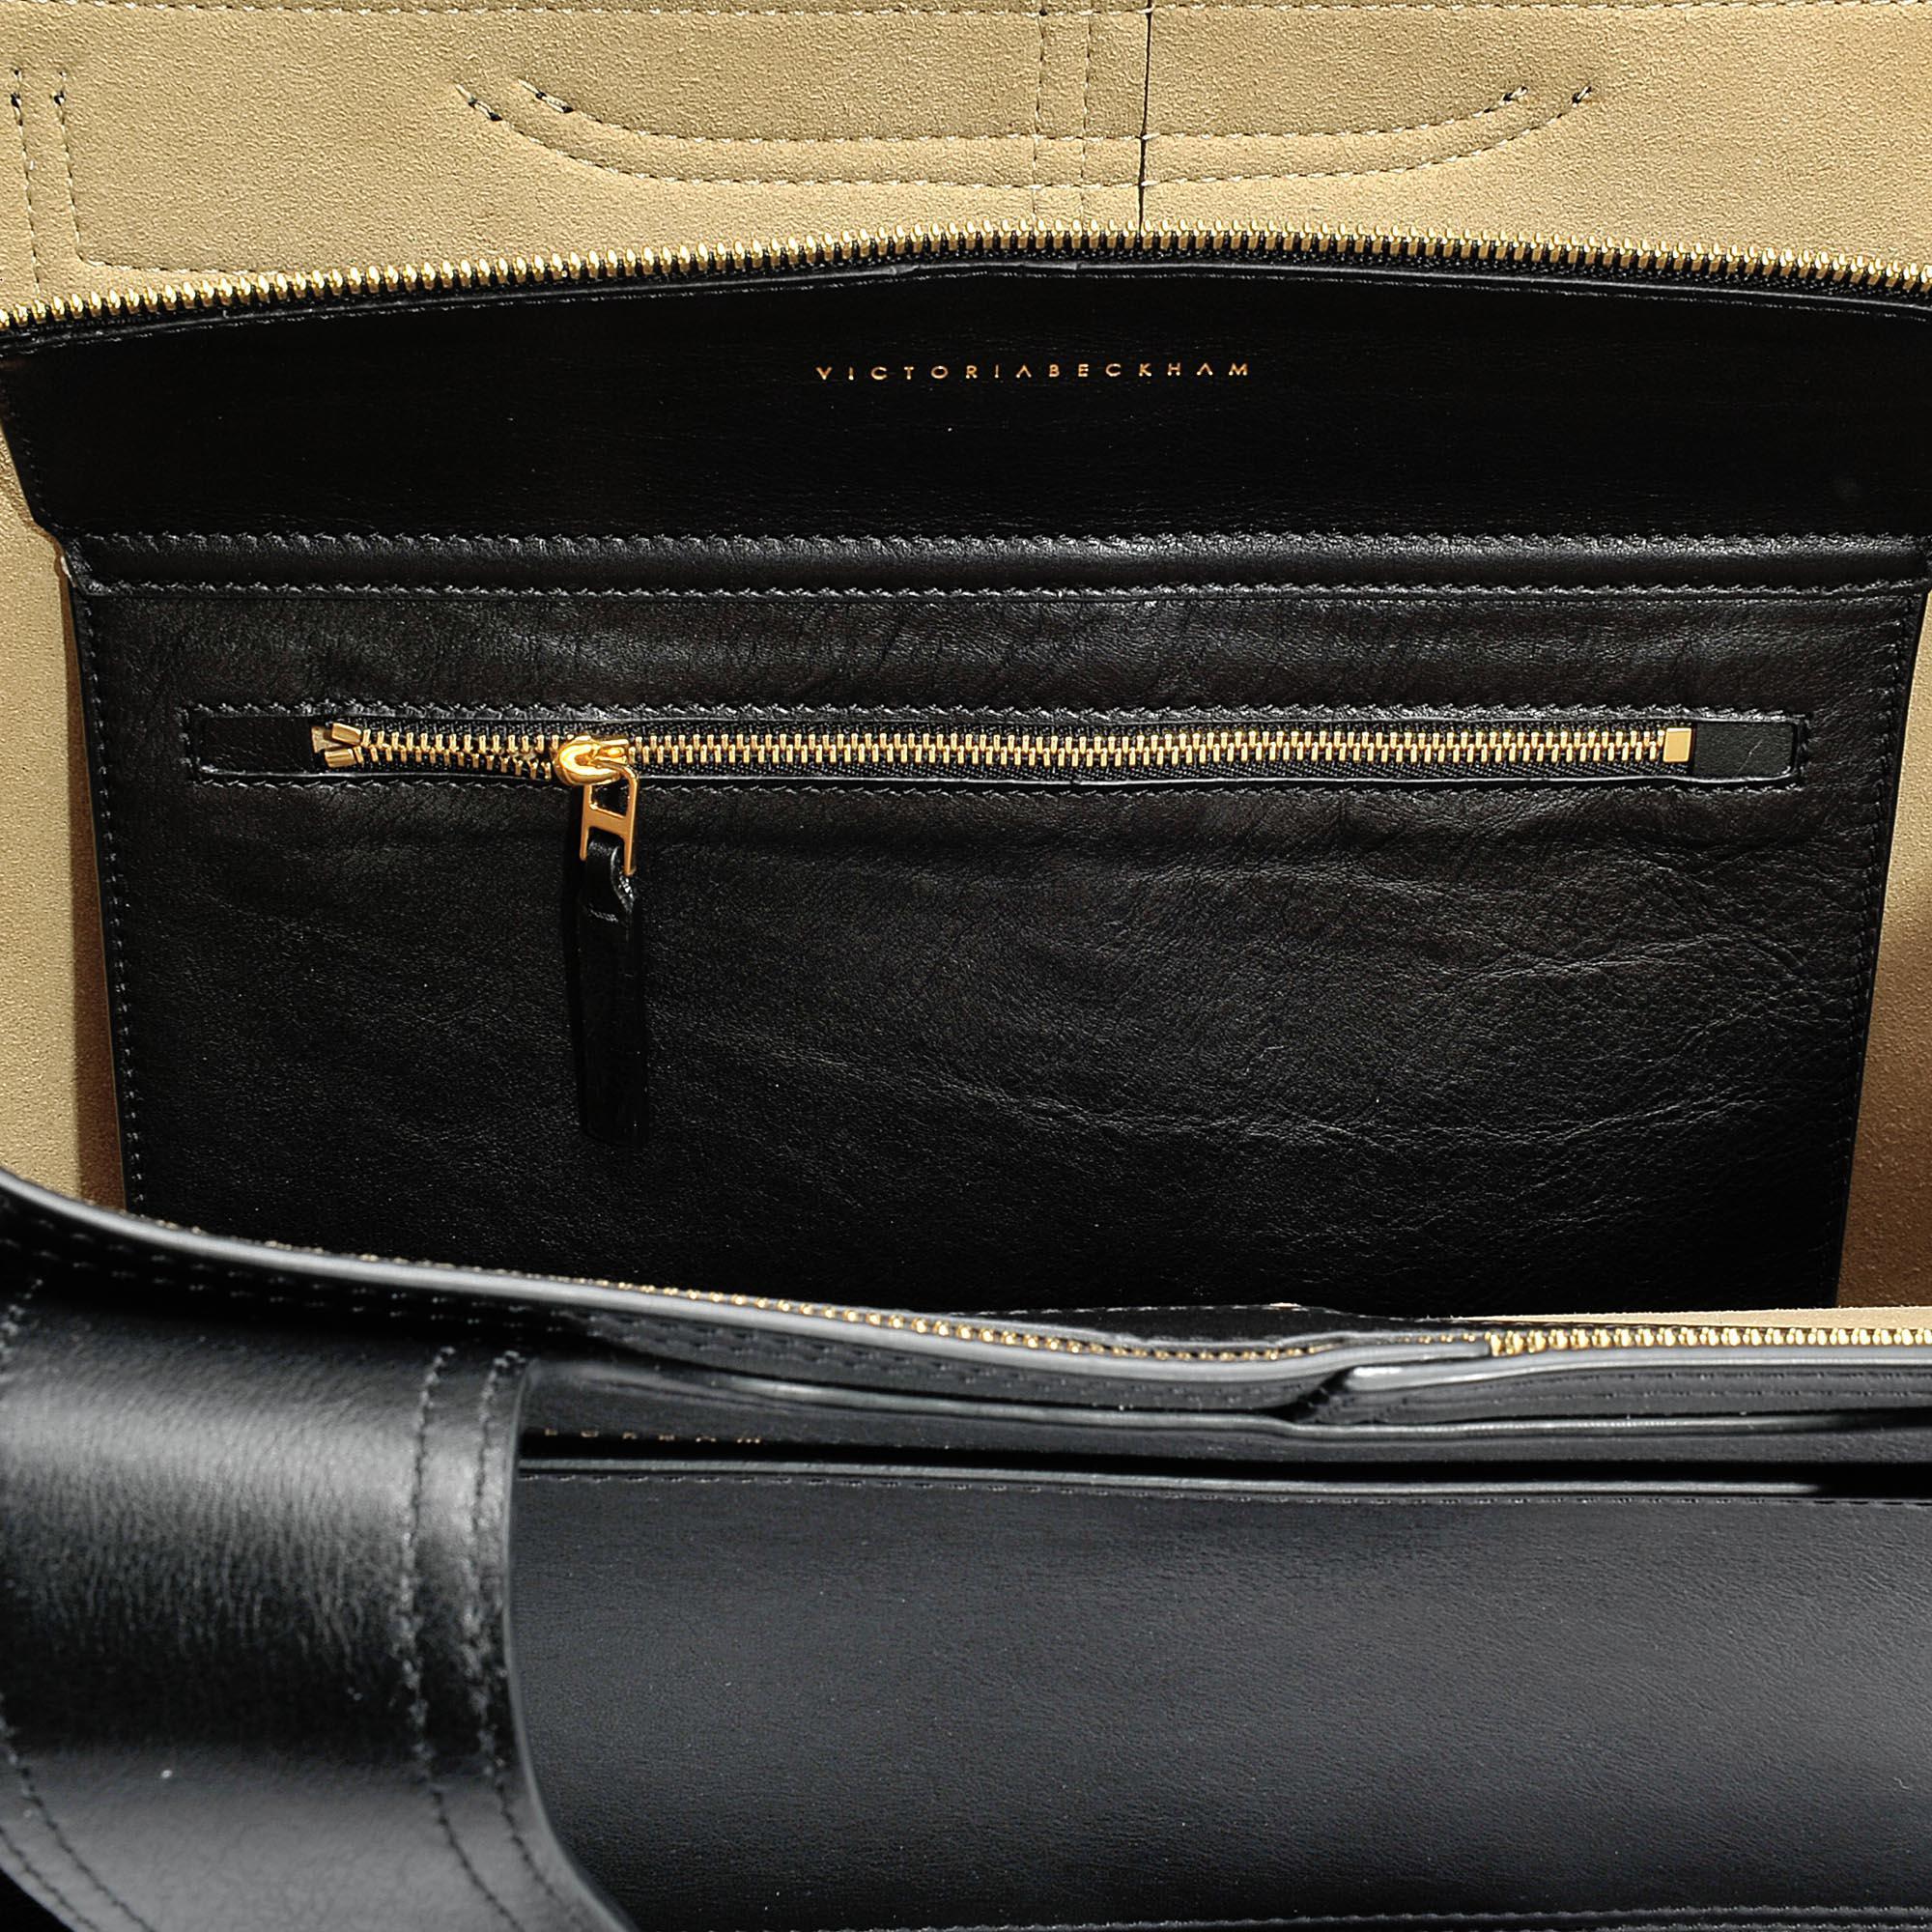 Victoria Beckham Apron Tote Bag in Black Celtic Calfskin fUATNN0